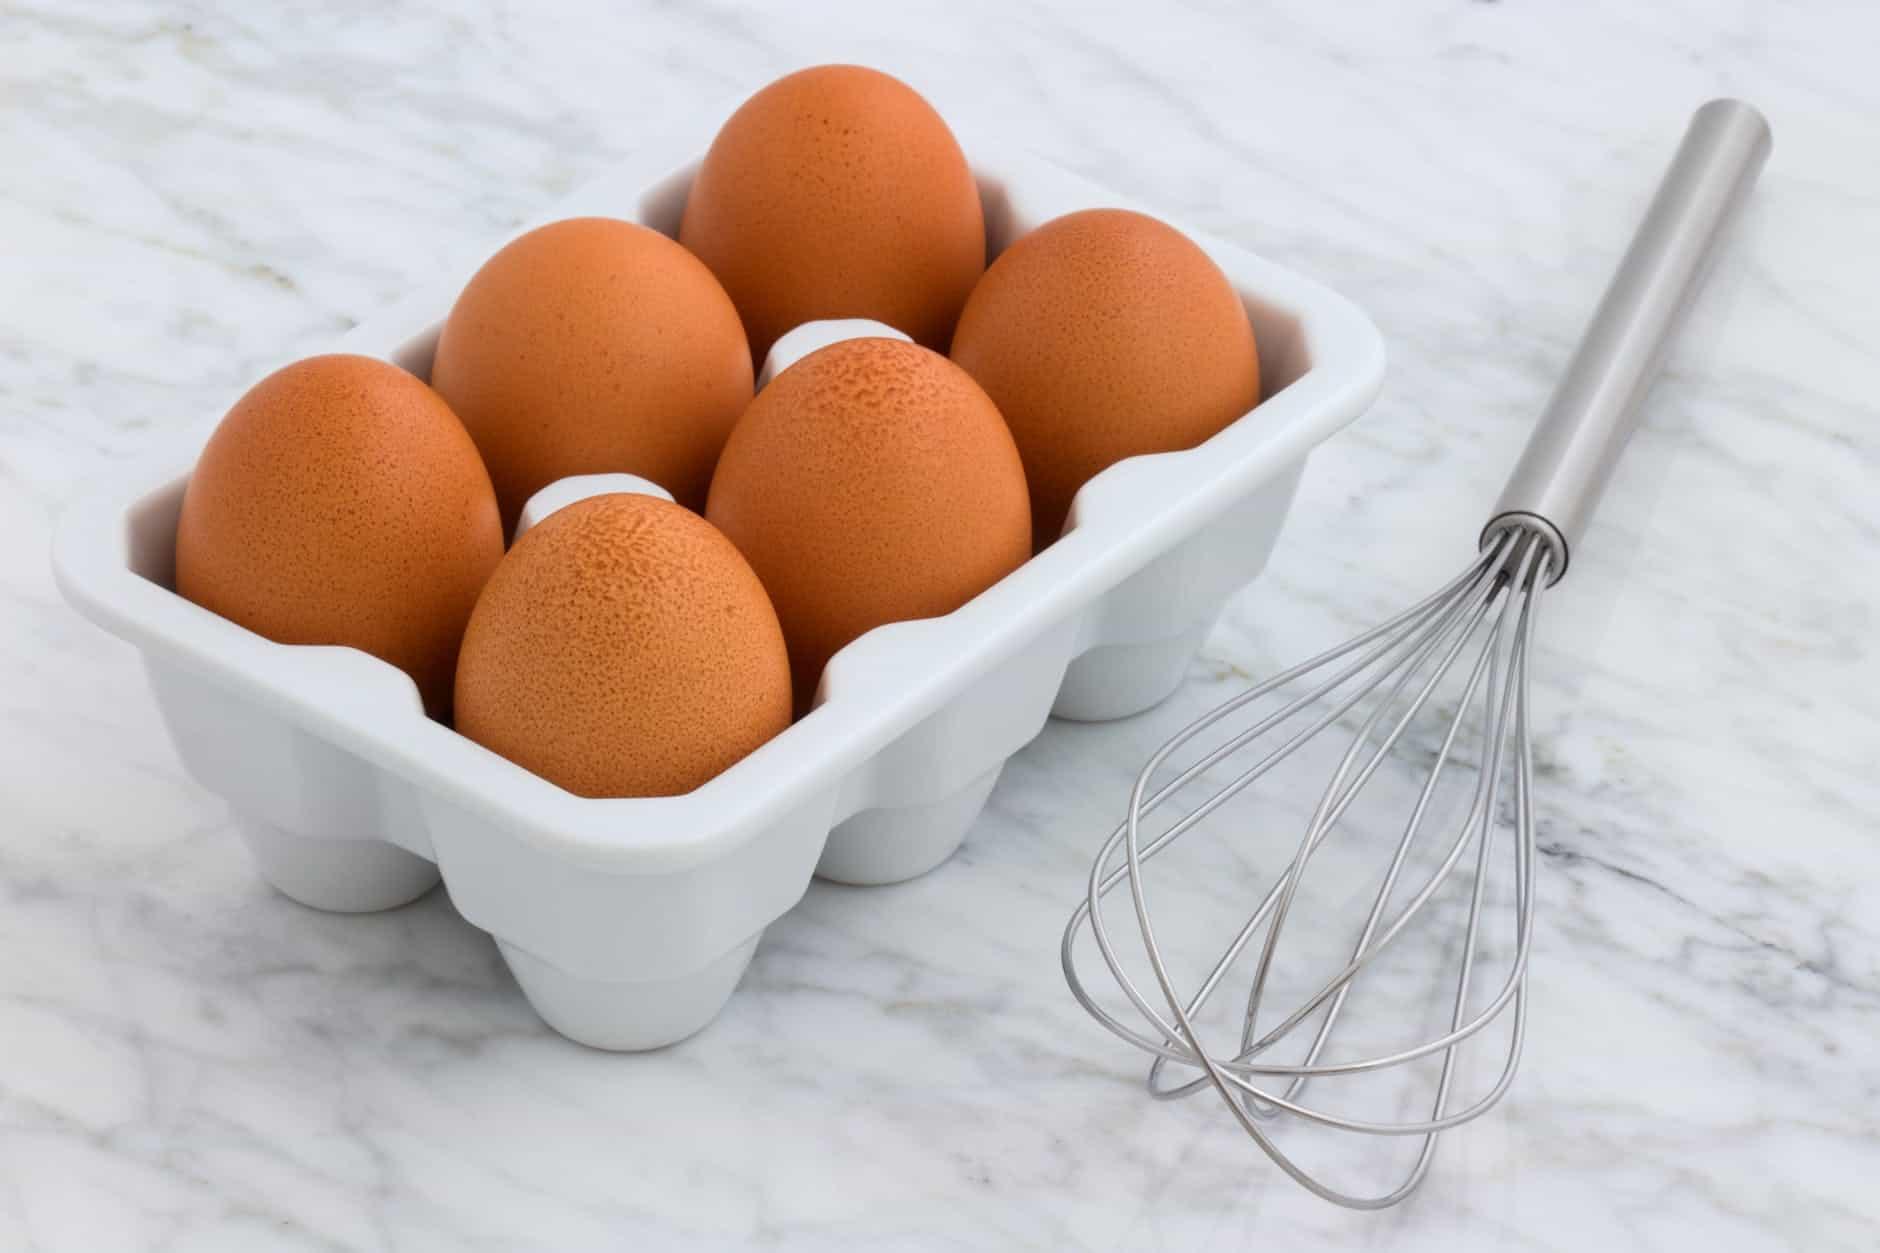 The Benefits Of Organic Eggs